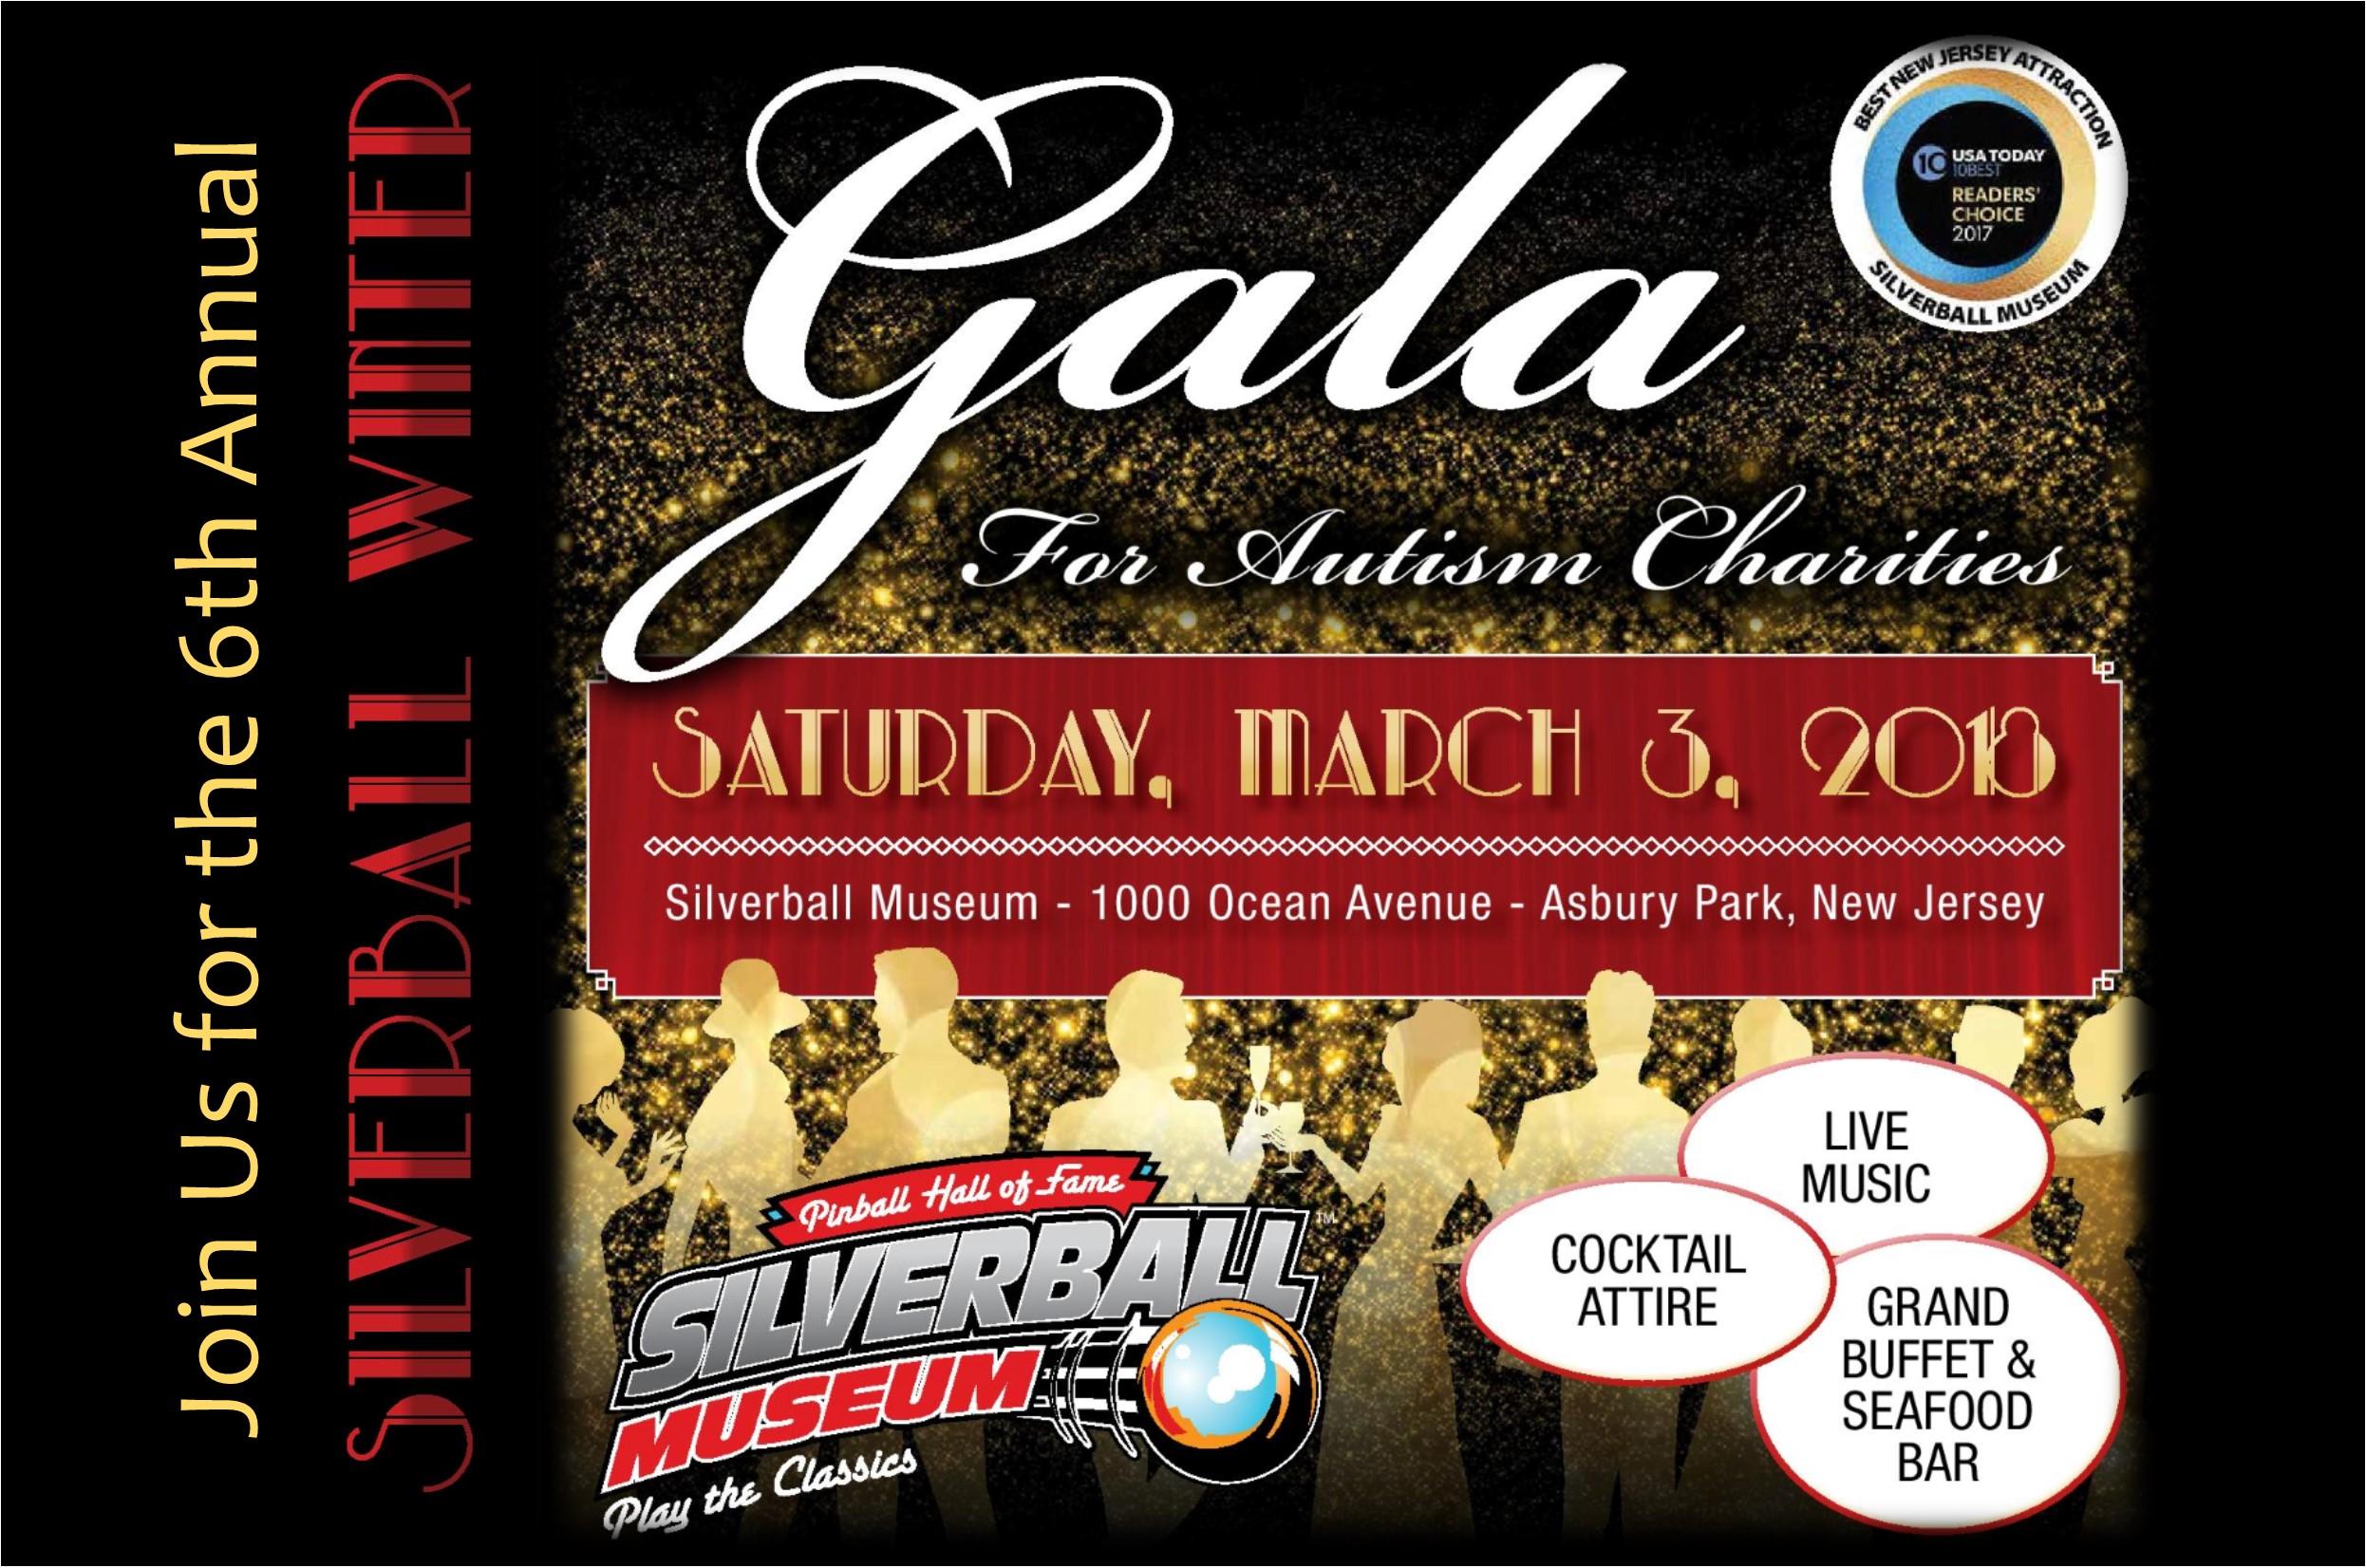 2018 Silverball Winter Gala